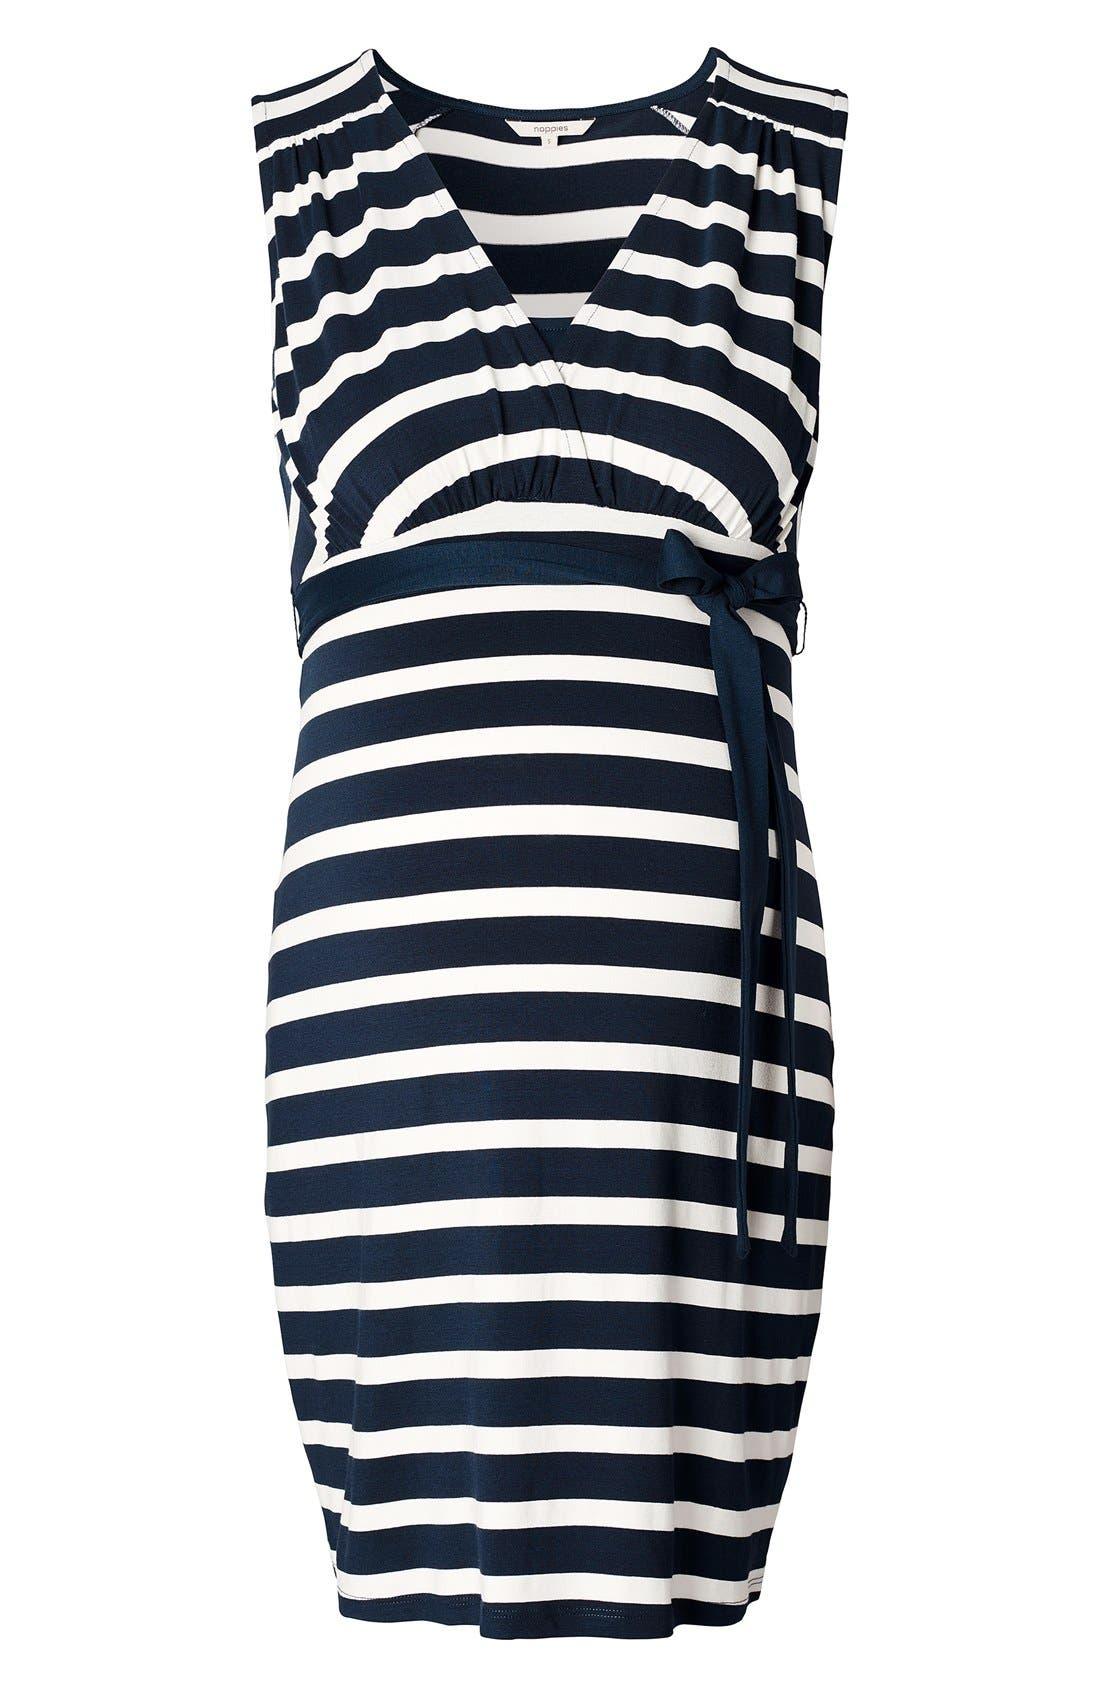 Alternate Image 1 Selected - Noppies 'Lara' Stripe Maternity Dress